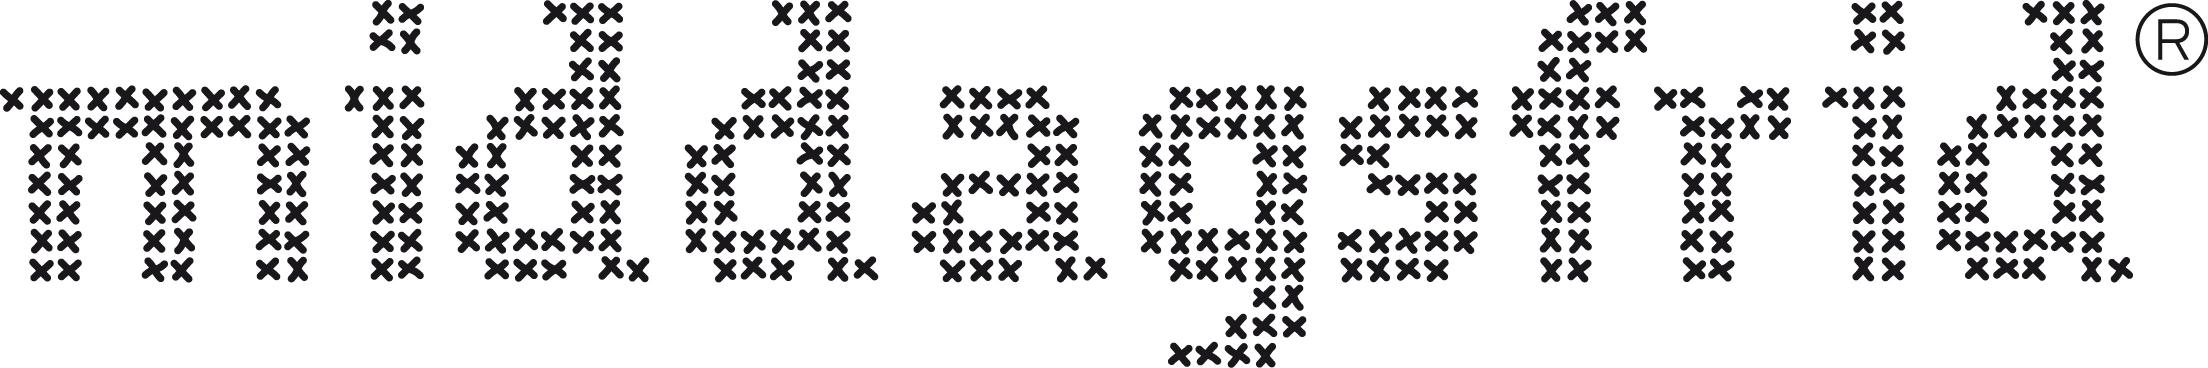 middagsfrids logotype